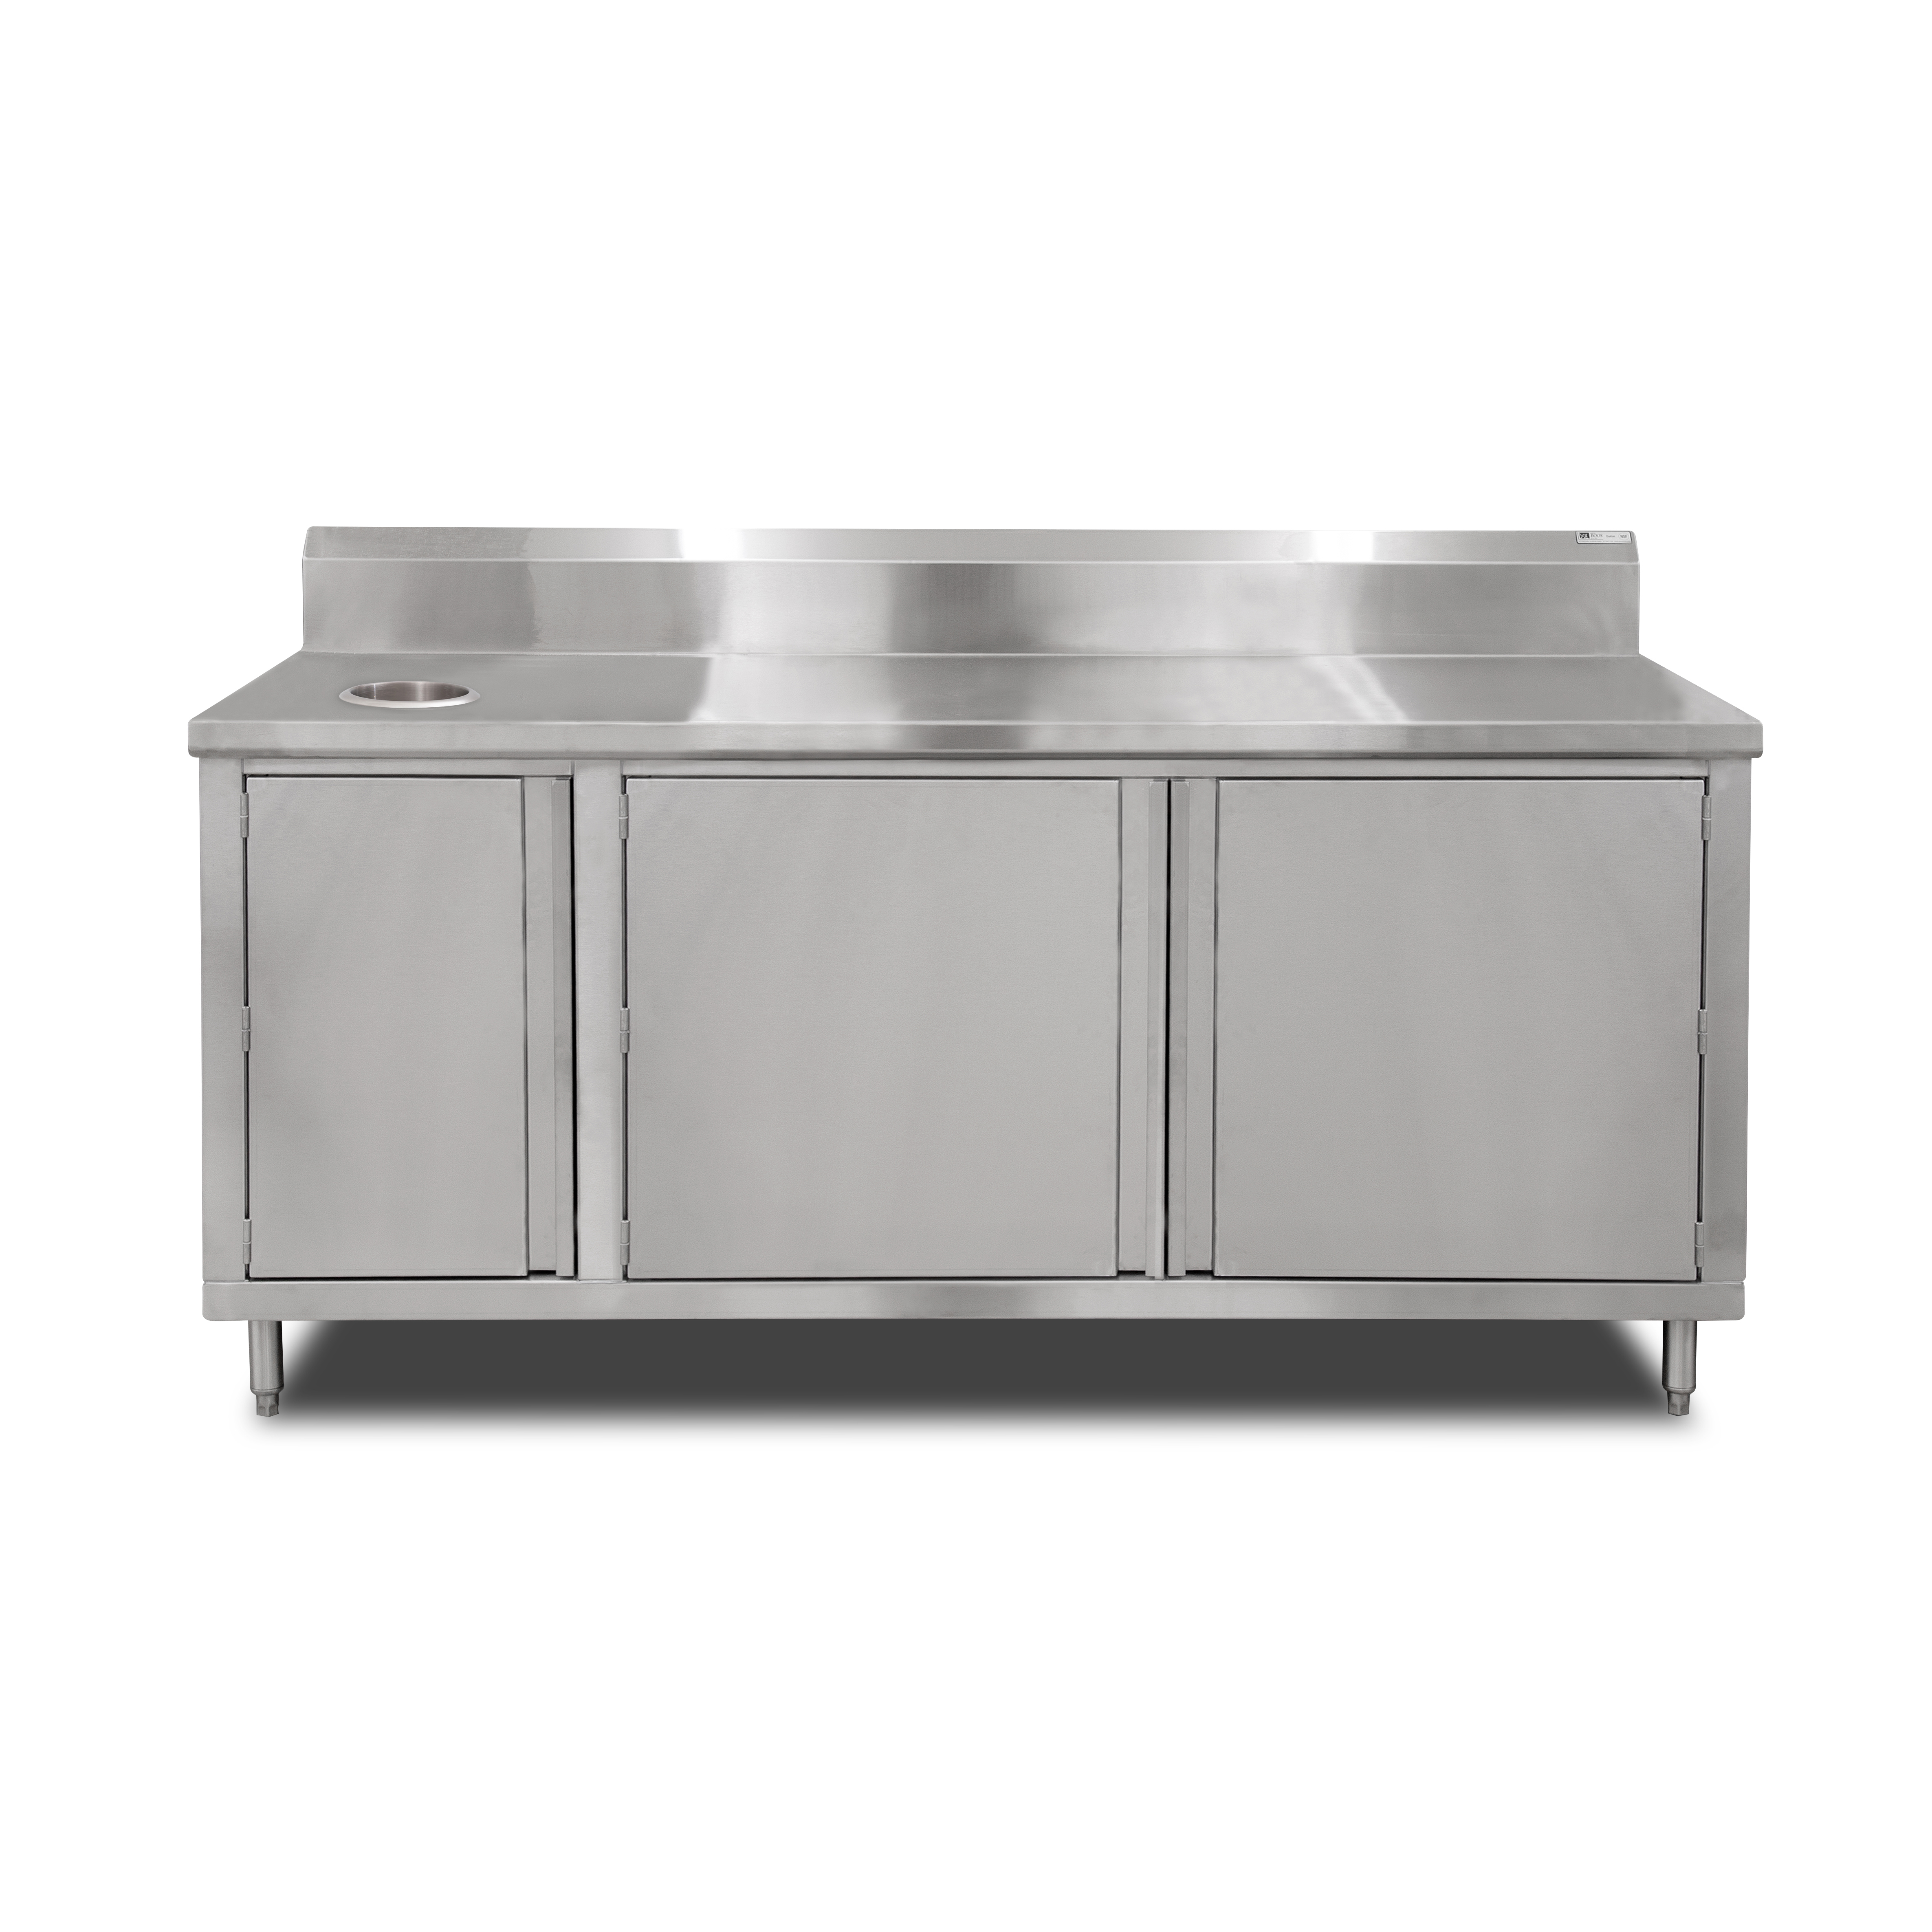 John Boos 4BU4R5-3672-L work table, cabinet base hinged doors